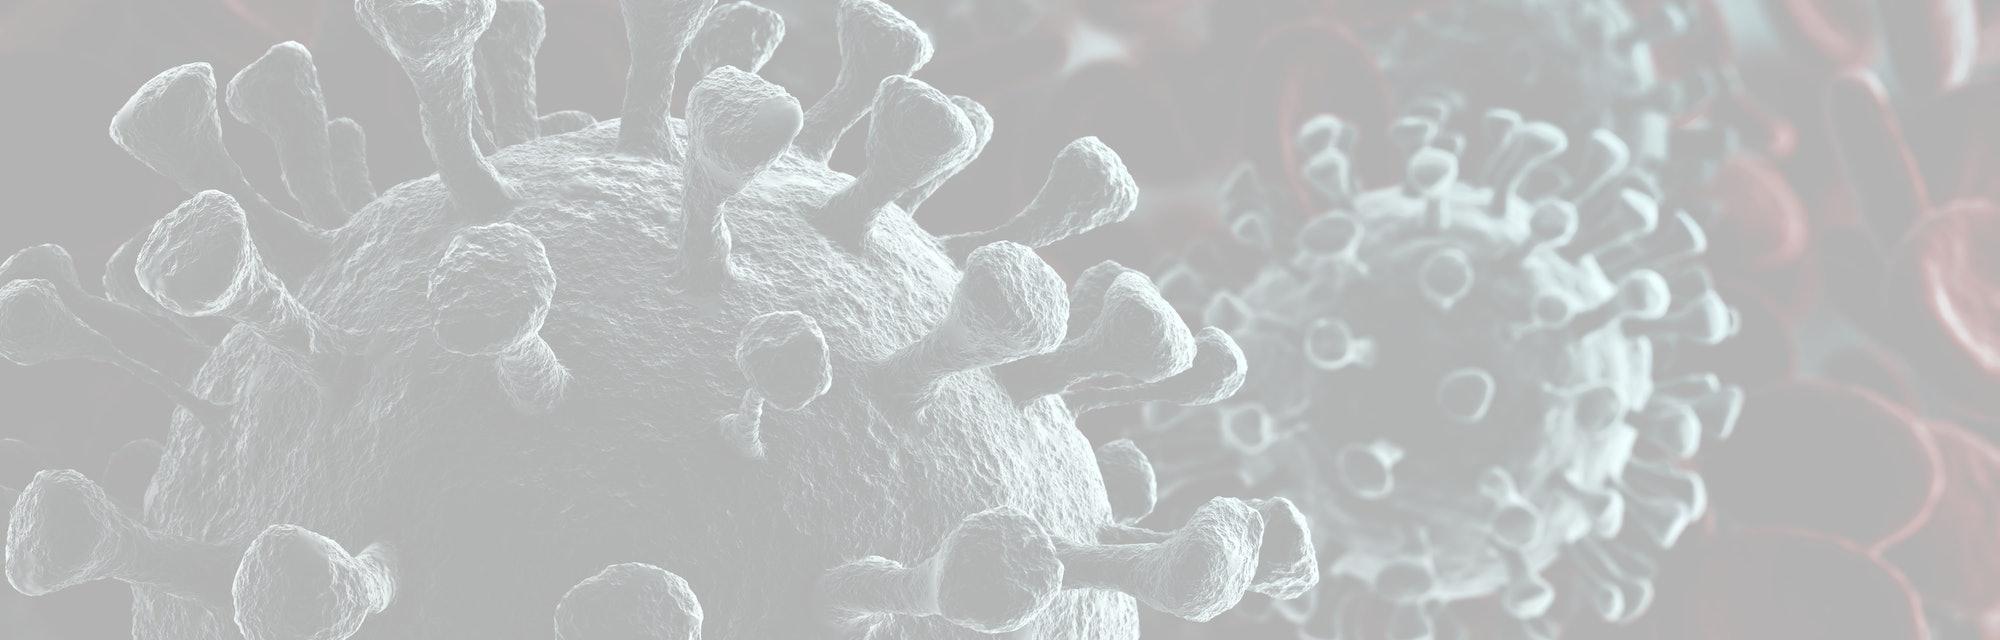 Coronavirus 2019-nCov novel coronavirus concept resposible for asian flu outbreak and coronaviruses influenza as dangerous flu strain cases as a pandemic. Microscope virus close up. 3d rendering.